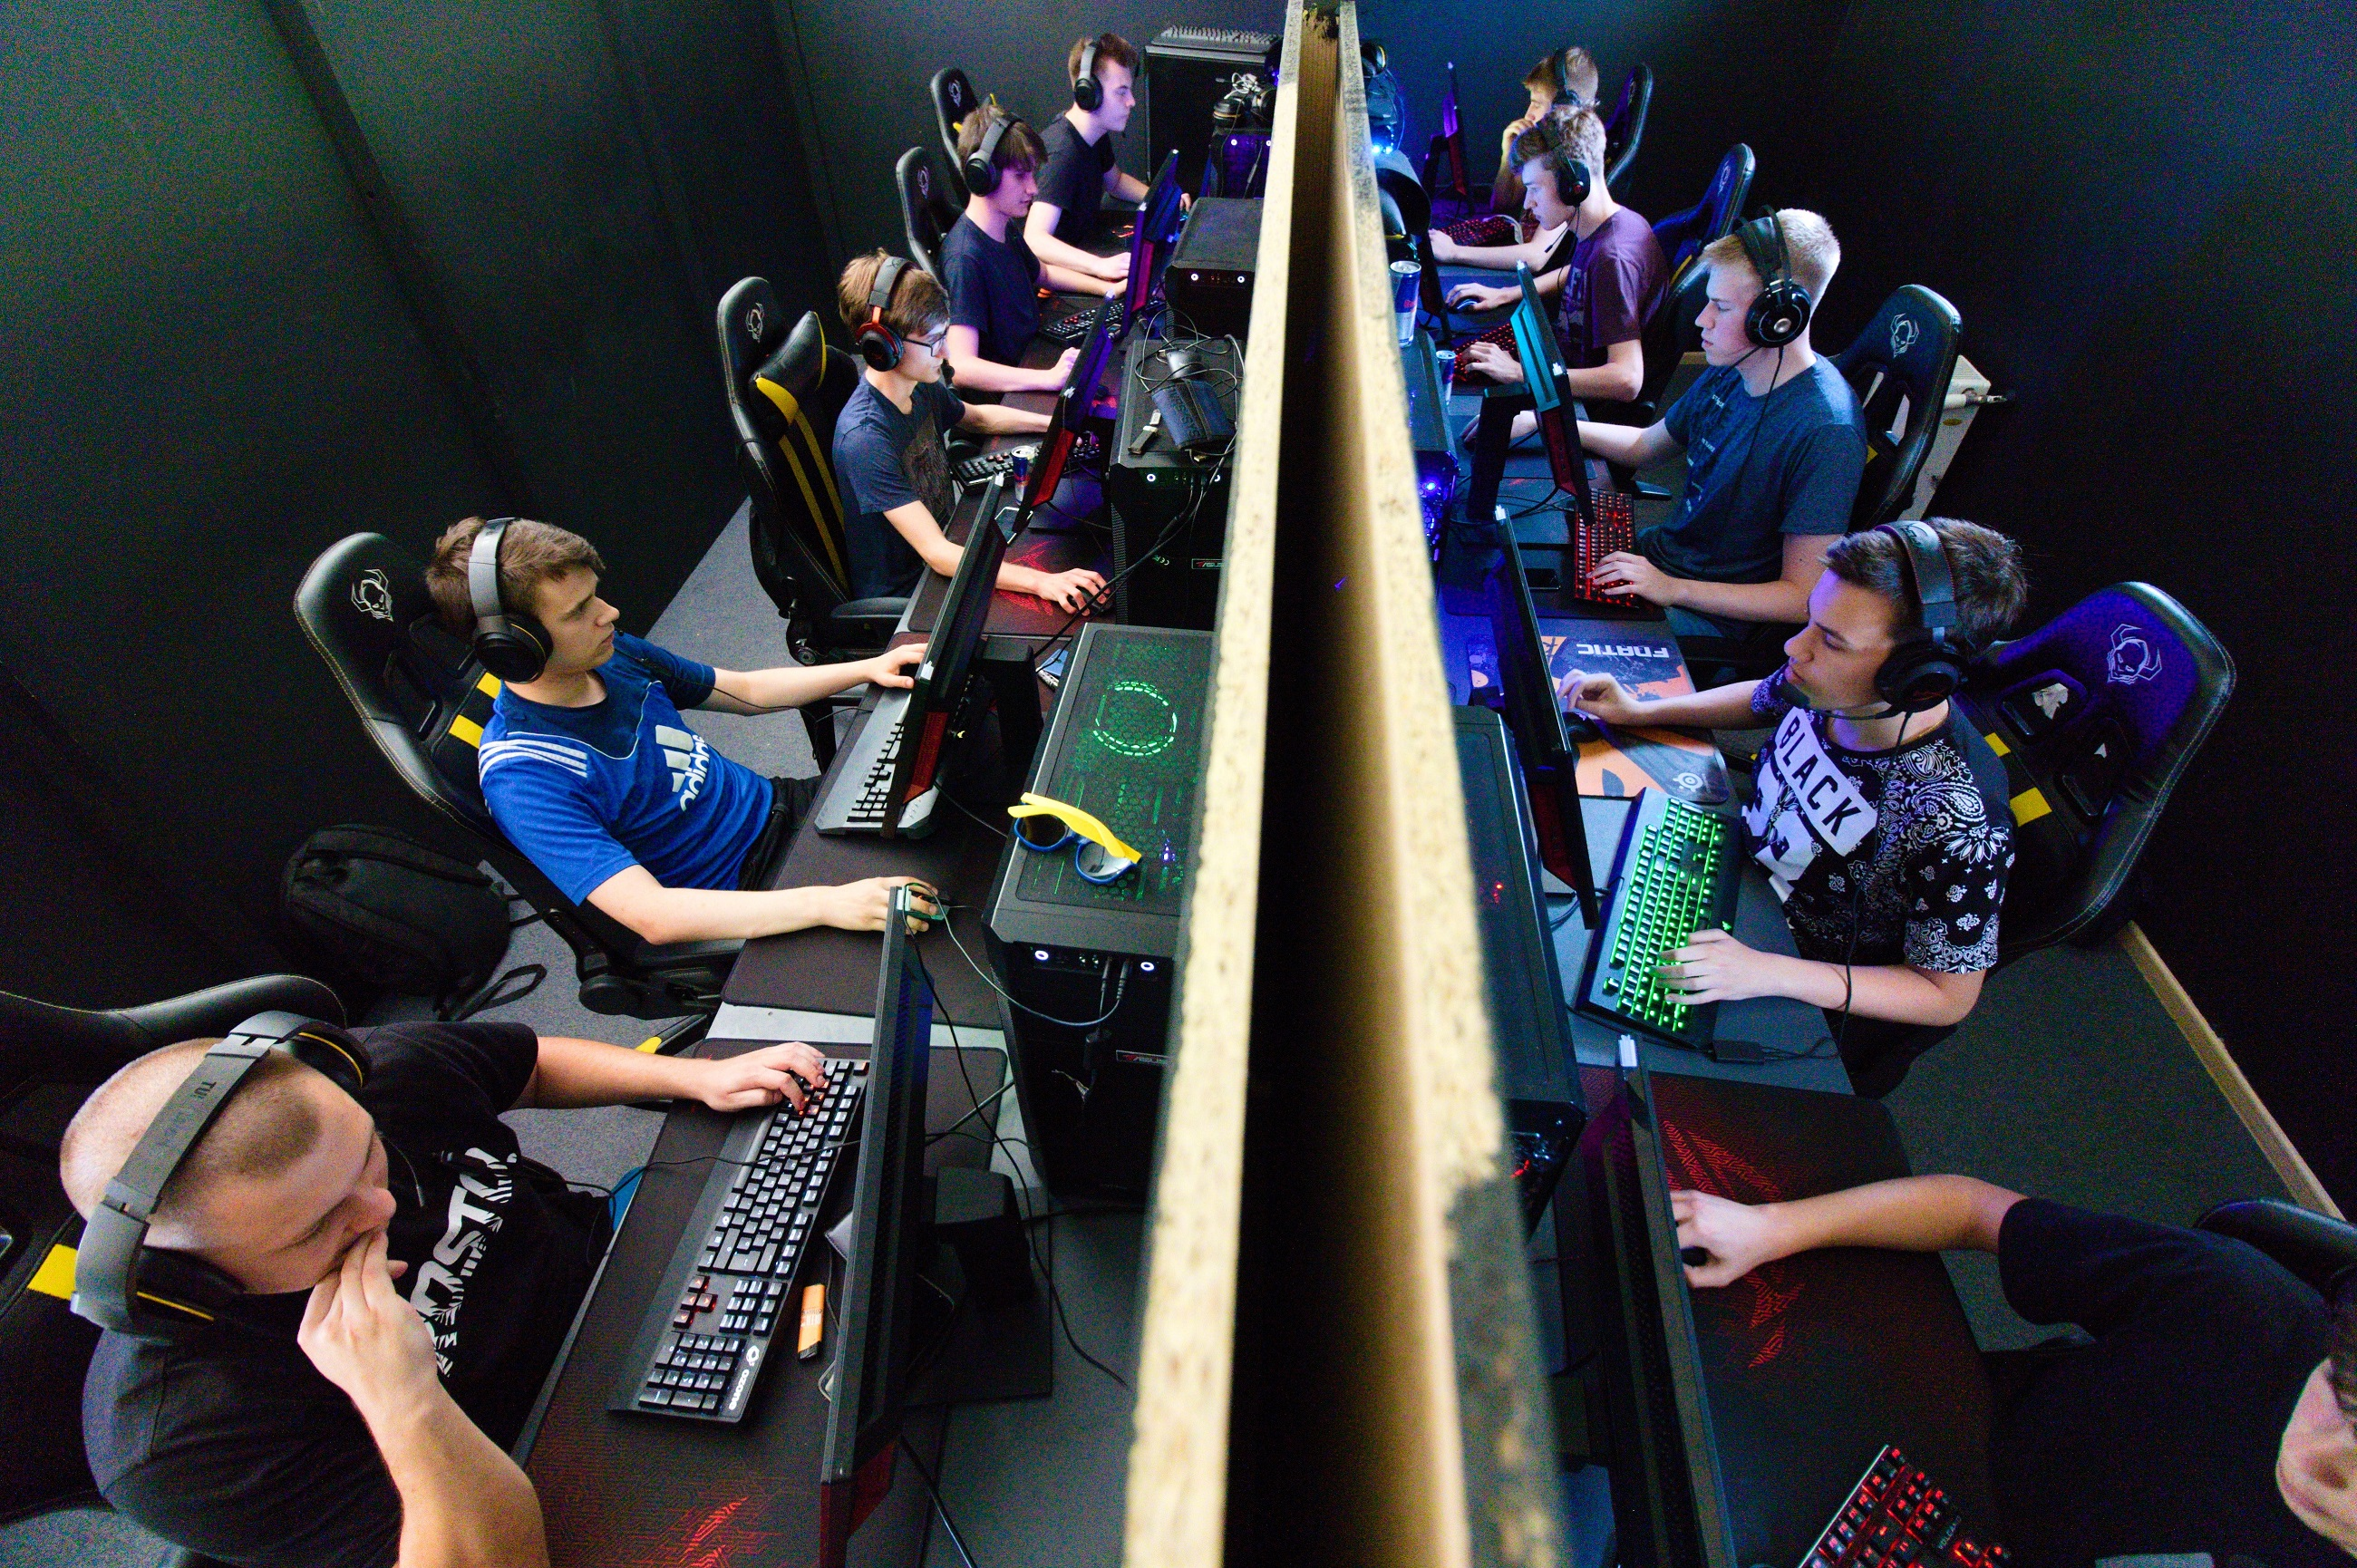 Cek Jadwal Turnamen Esports SEA Games Di Sini